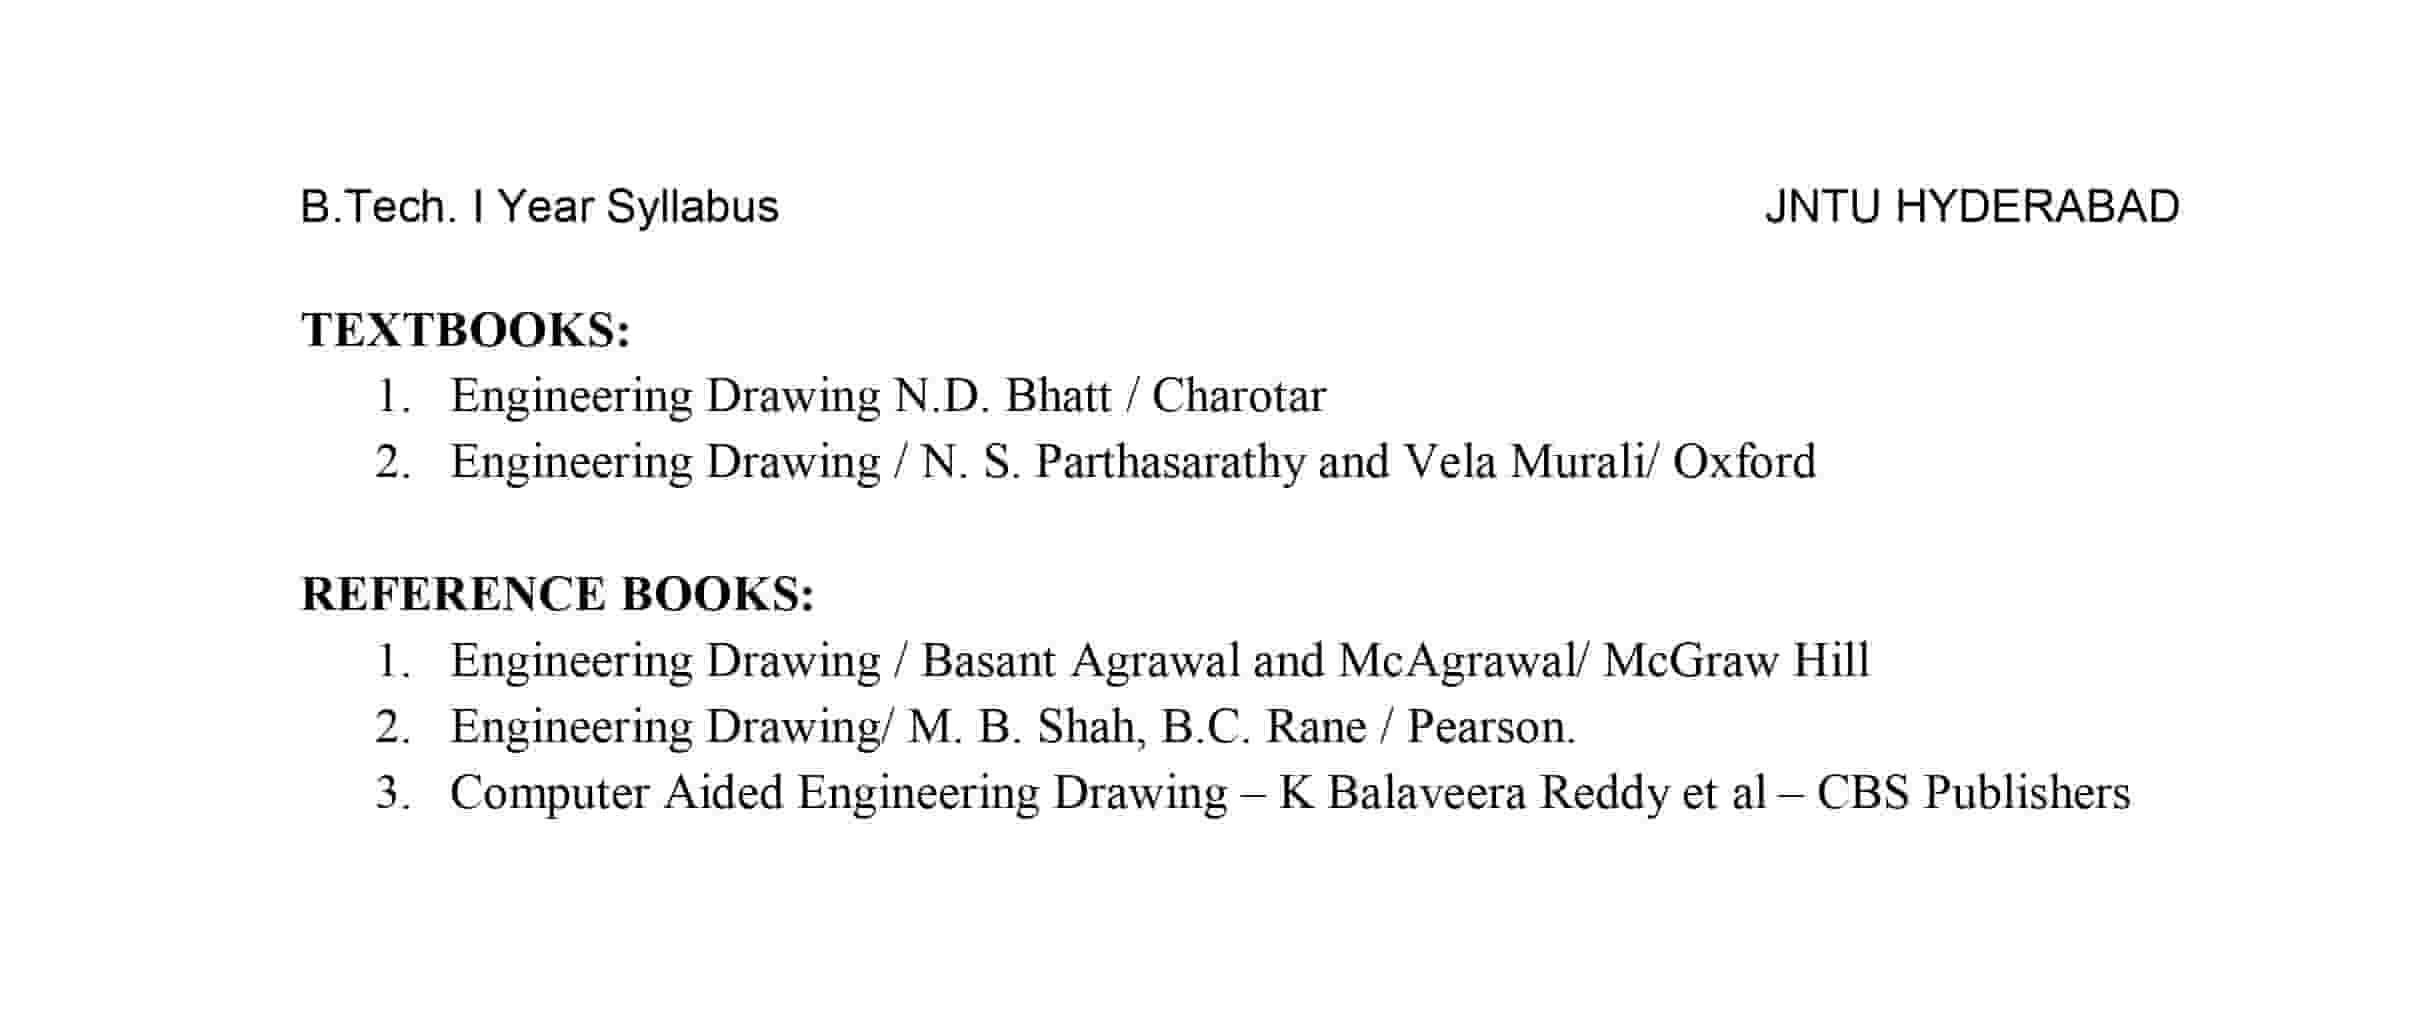 engineering drawing engineering graphics btech r18 jntuh syllabus pdf download